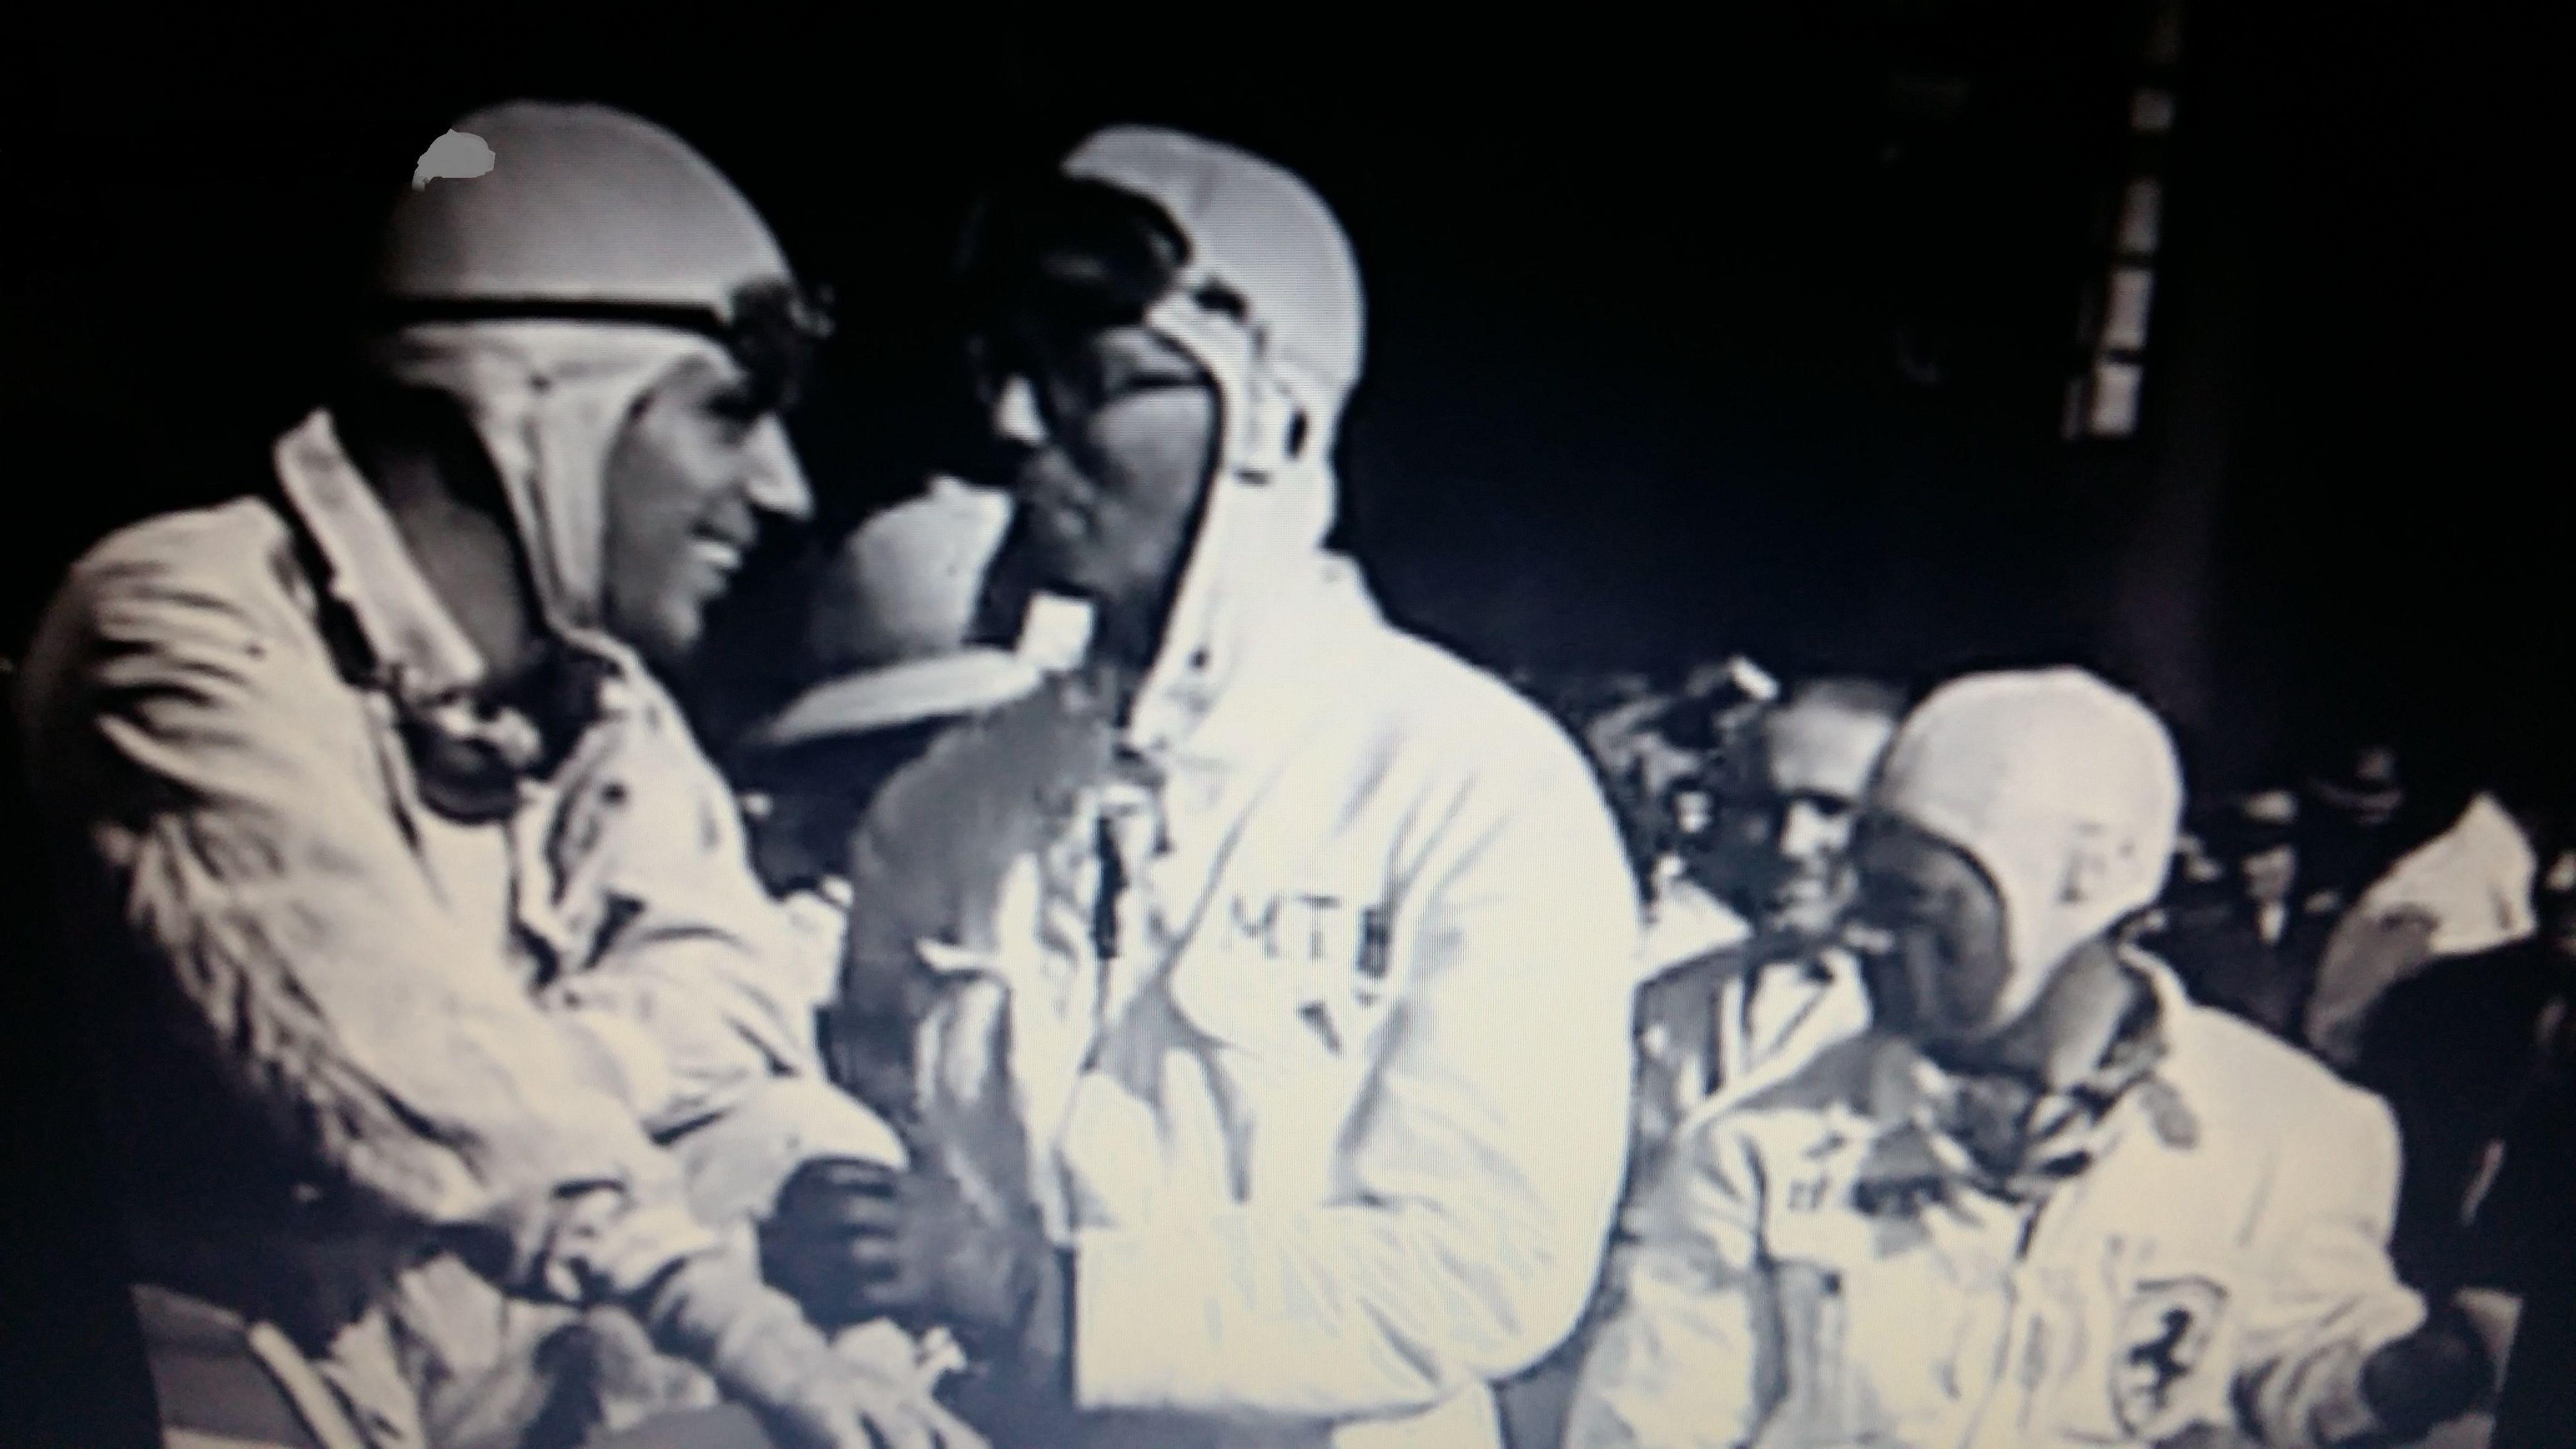 GP RIO DE JANEIRO (GAVEA) 1936 , Carlo Pintacuda , Atillio Marinoni (both of Scuderia Ferrari) ,  Manuel de Teffé on center.